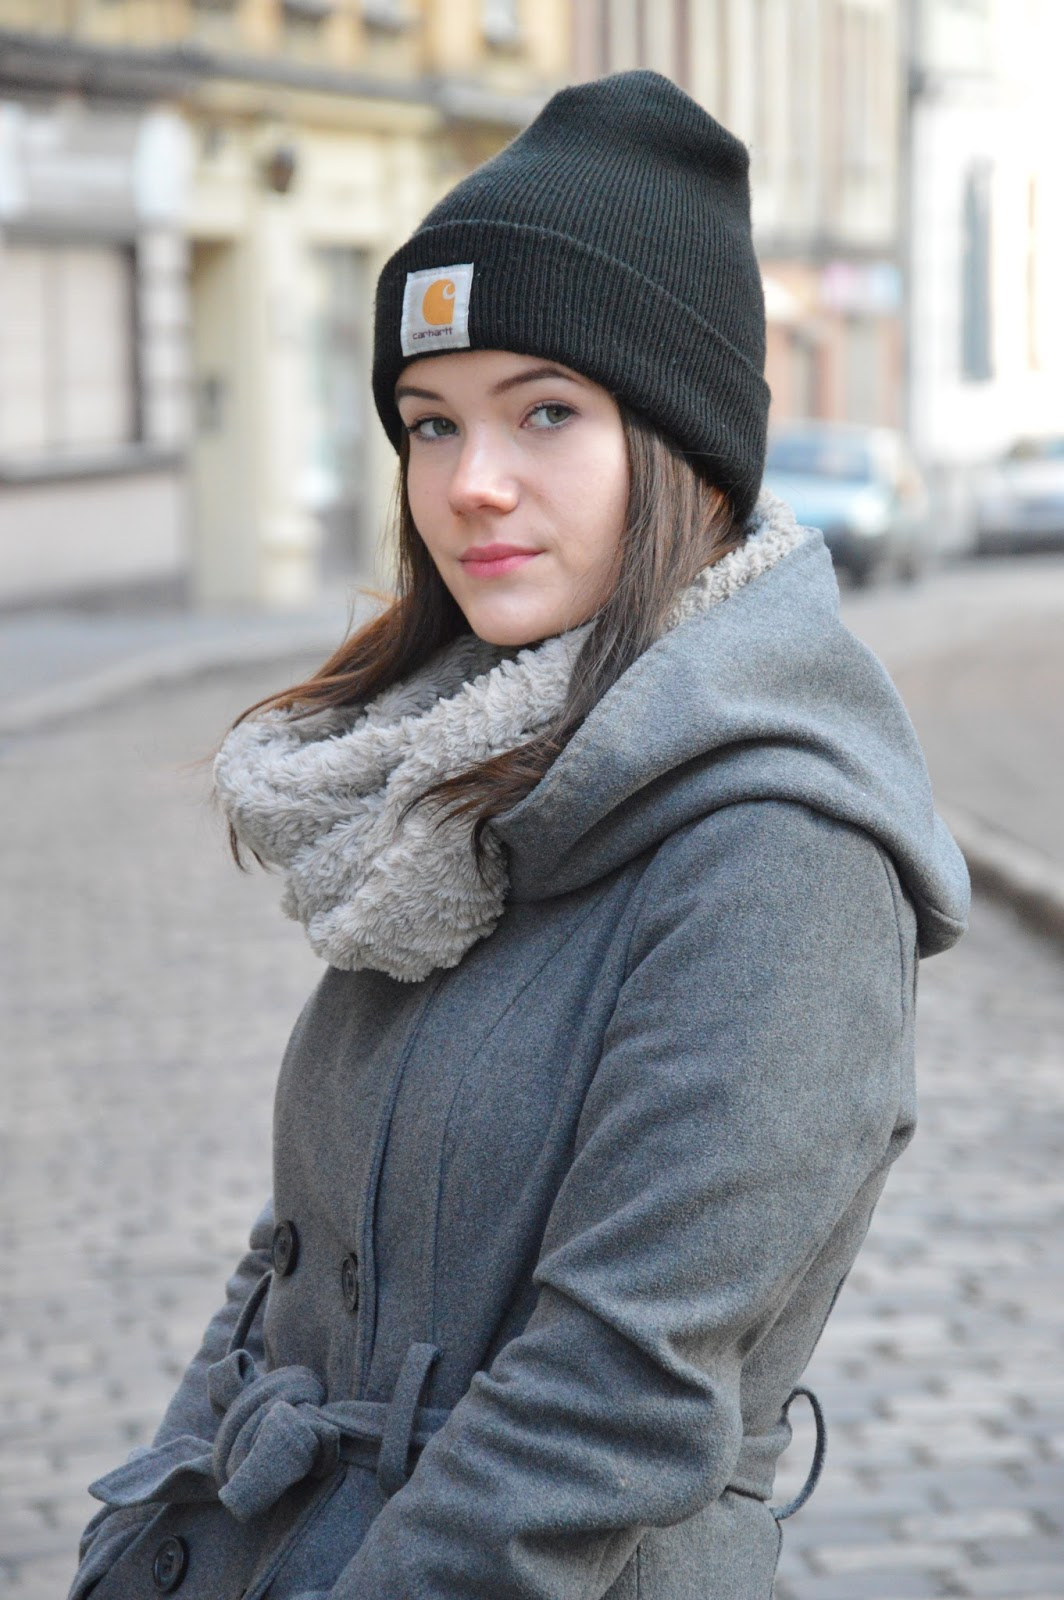 Justin Bieber - Company | Marta Dą…bek